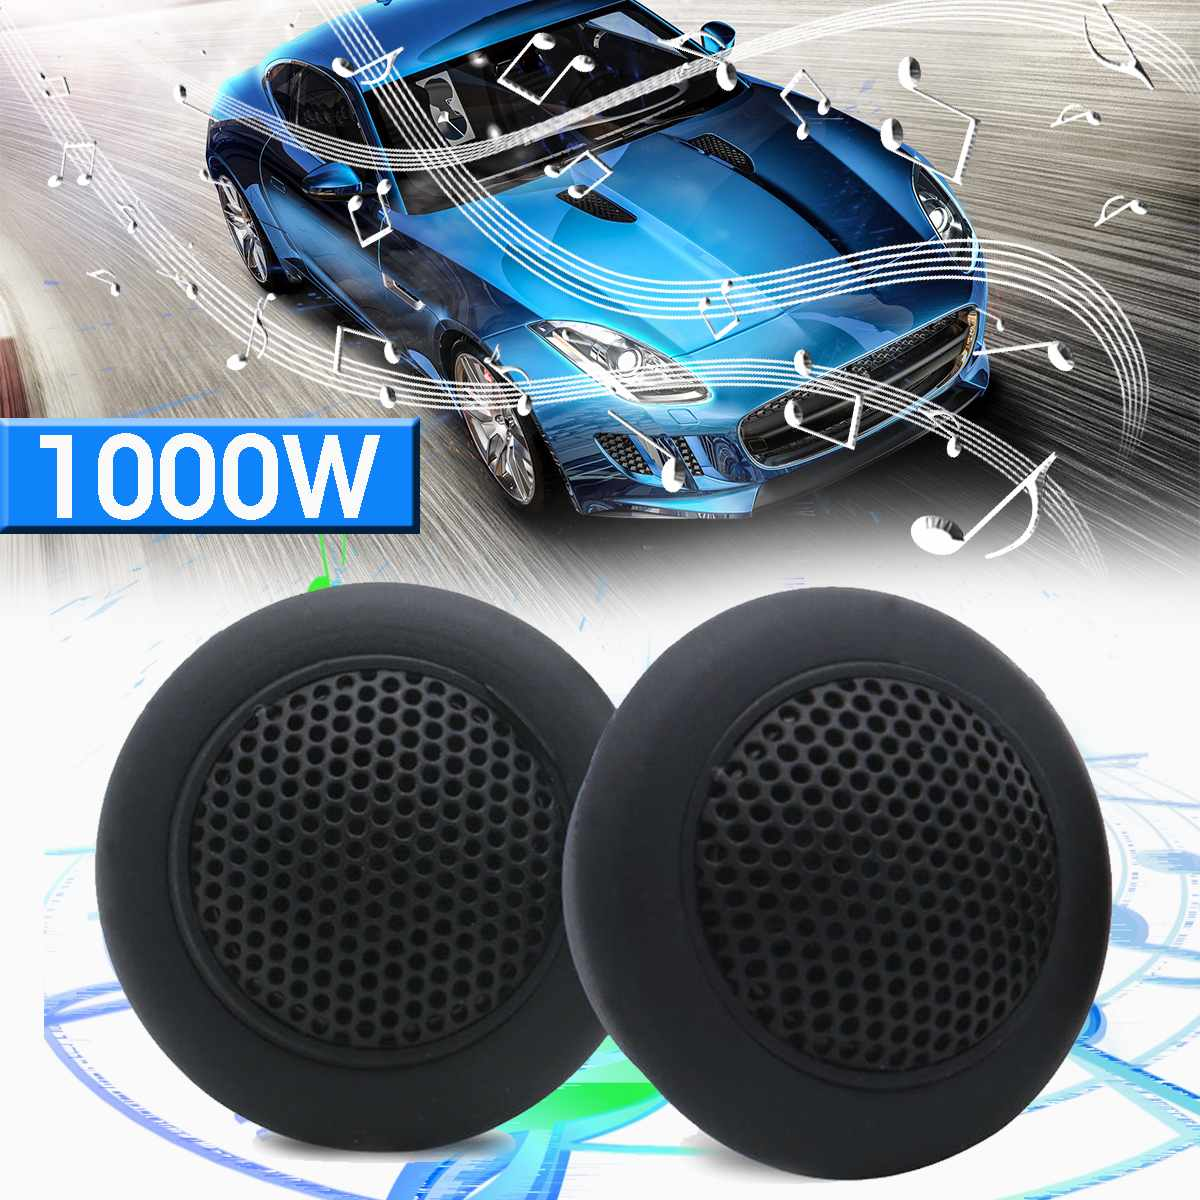 2pcs 89db 1000W HIFI Micro Dome Tweeters de Áudio Do Carro Alto-falantes de Música Altifalante de Corneta Automóvel Estéreo Agudos Falante Tweeters